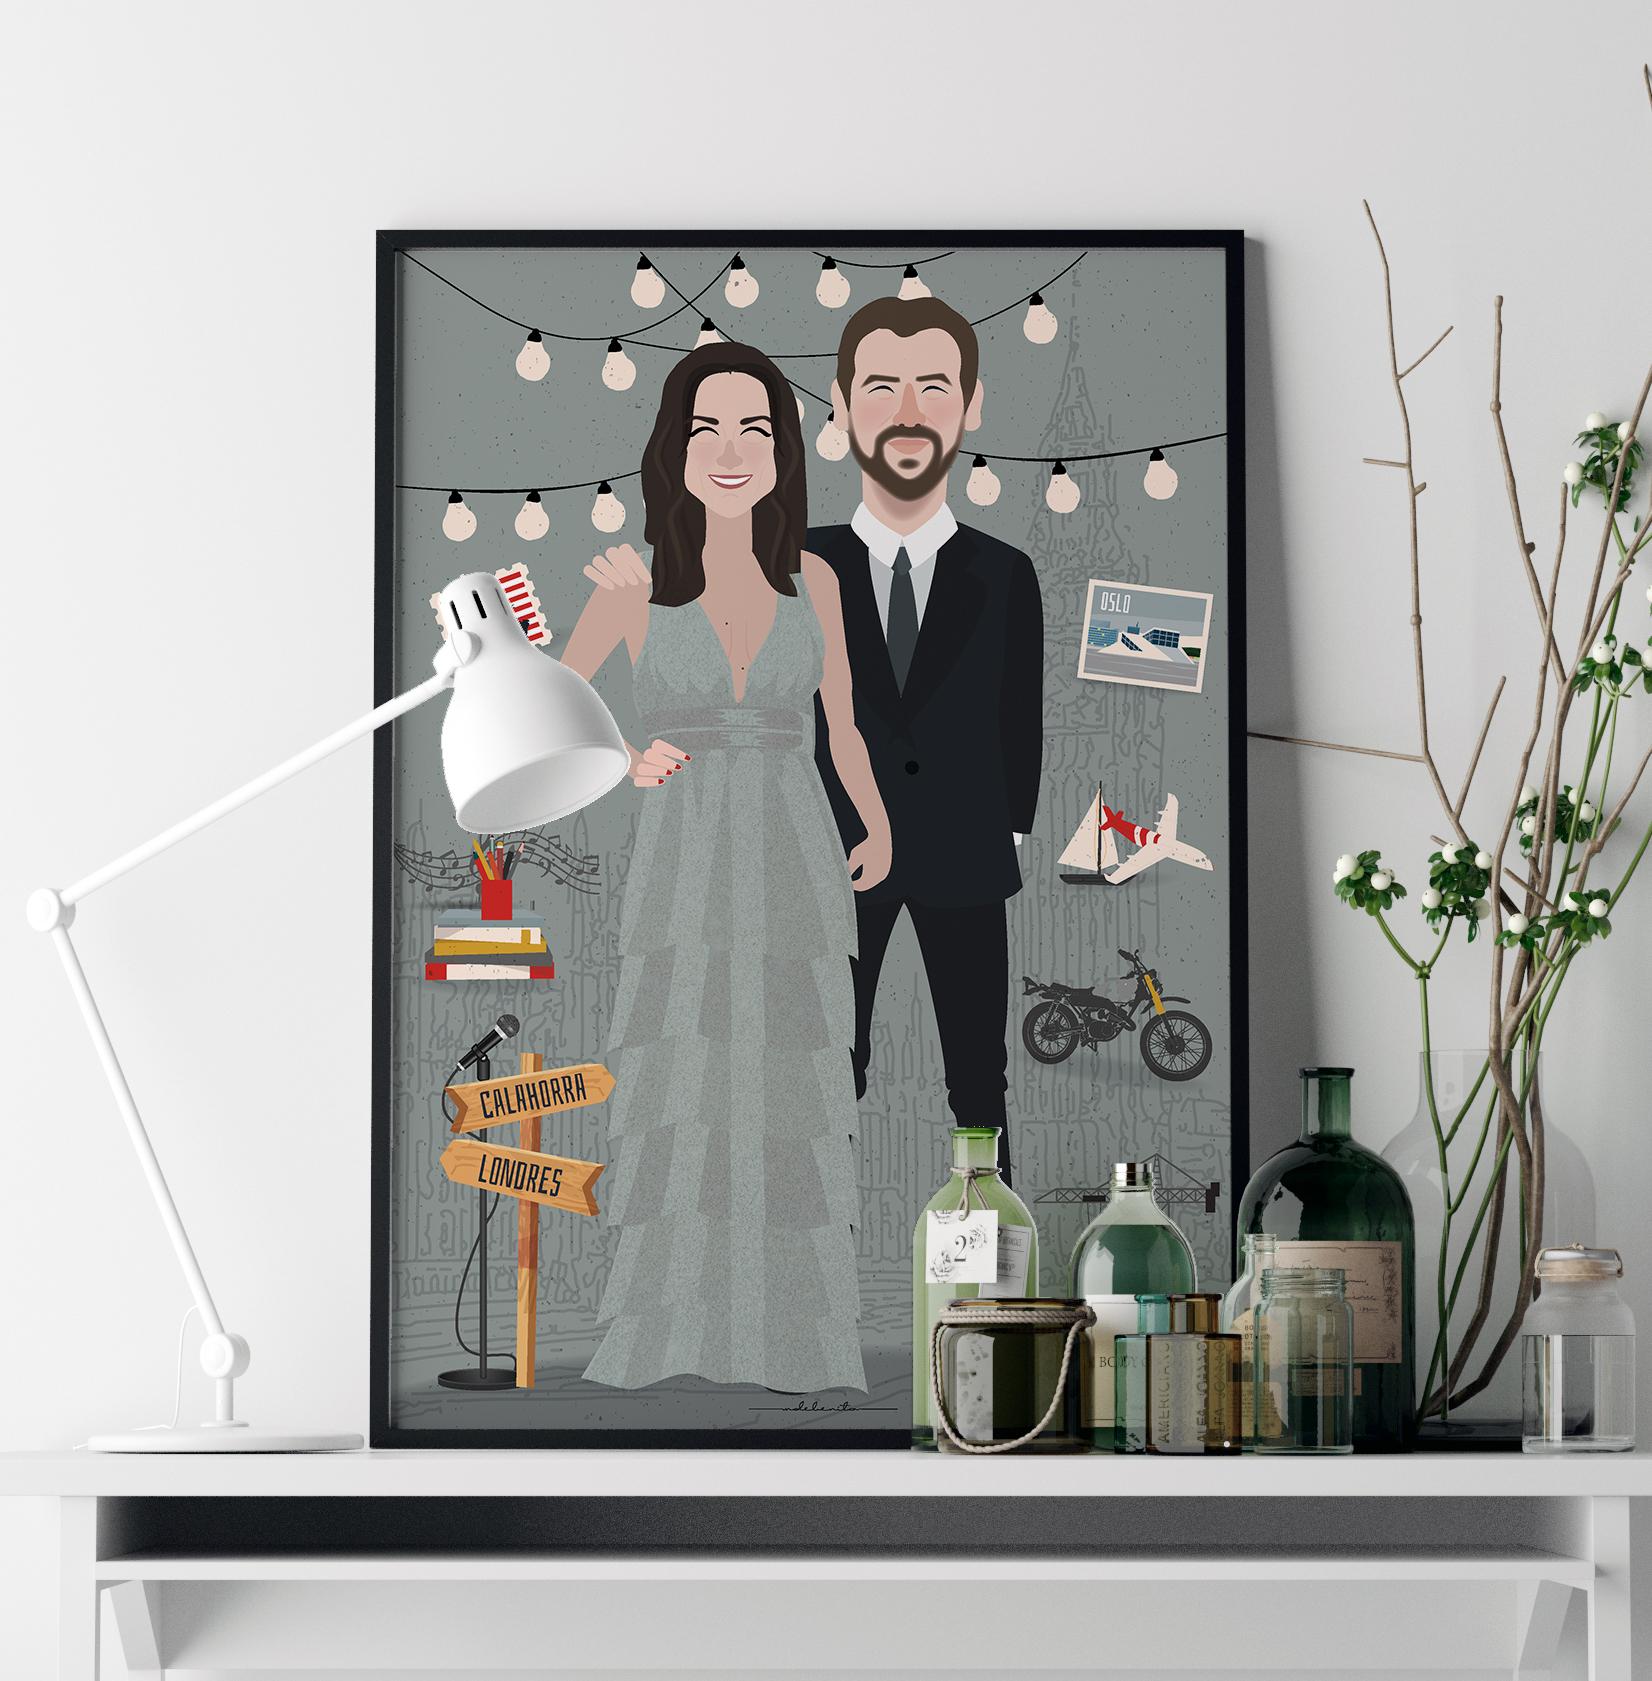 ilustracion-personalizada-regalo-pareja-boda-asturias-mdebenito-original.jpg